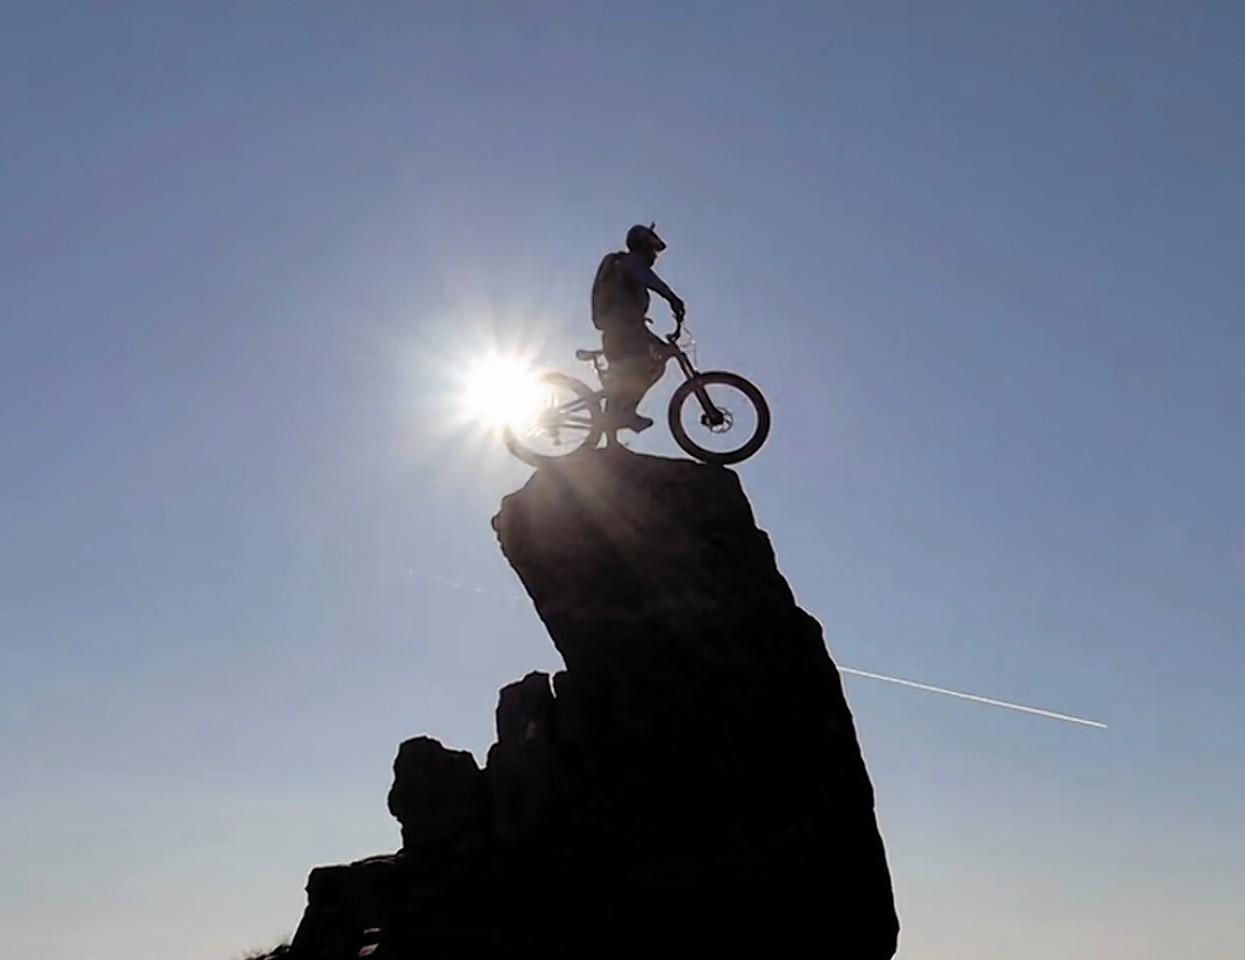 Danny MacAskill during his latest daring stunt